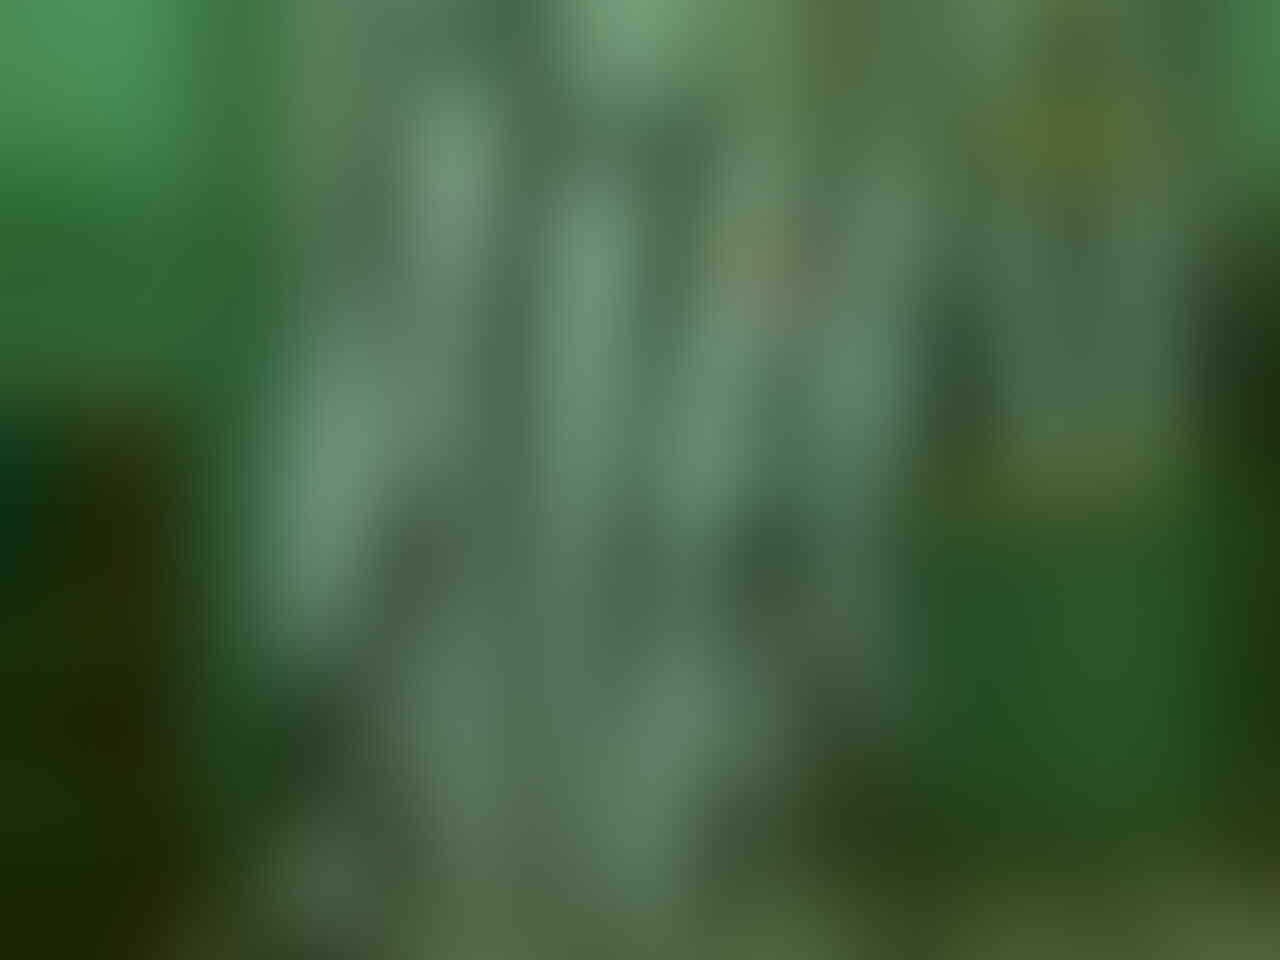 RUMAH JUVENTINI:GRADEORI@1454Rb,CELANA KW@654Rb,JUMPER BABY,OLD JERSEY,etc ABOUT JUVE